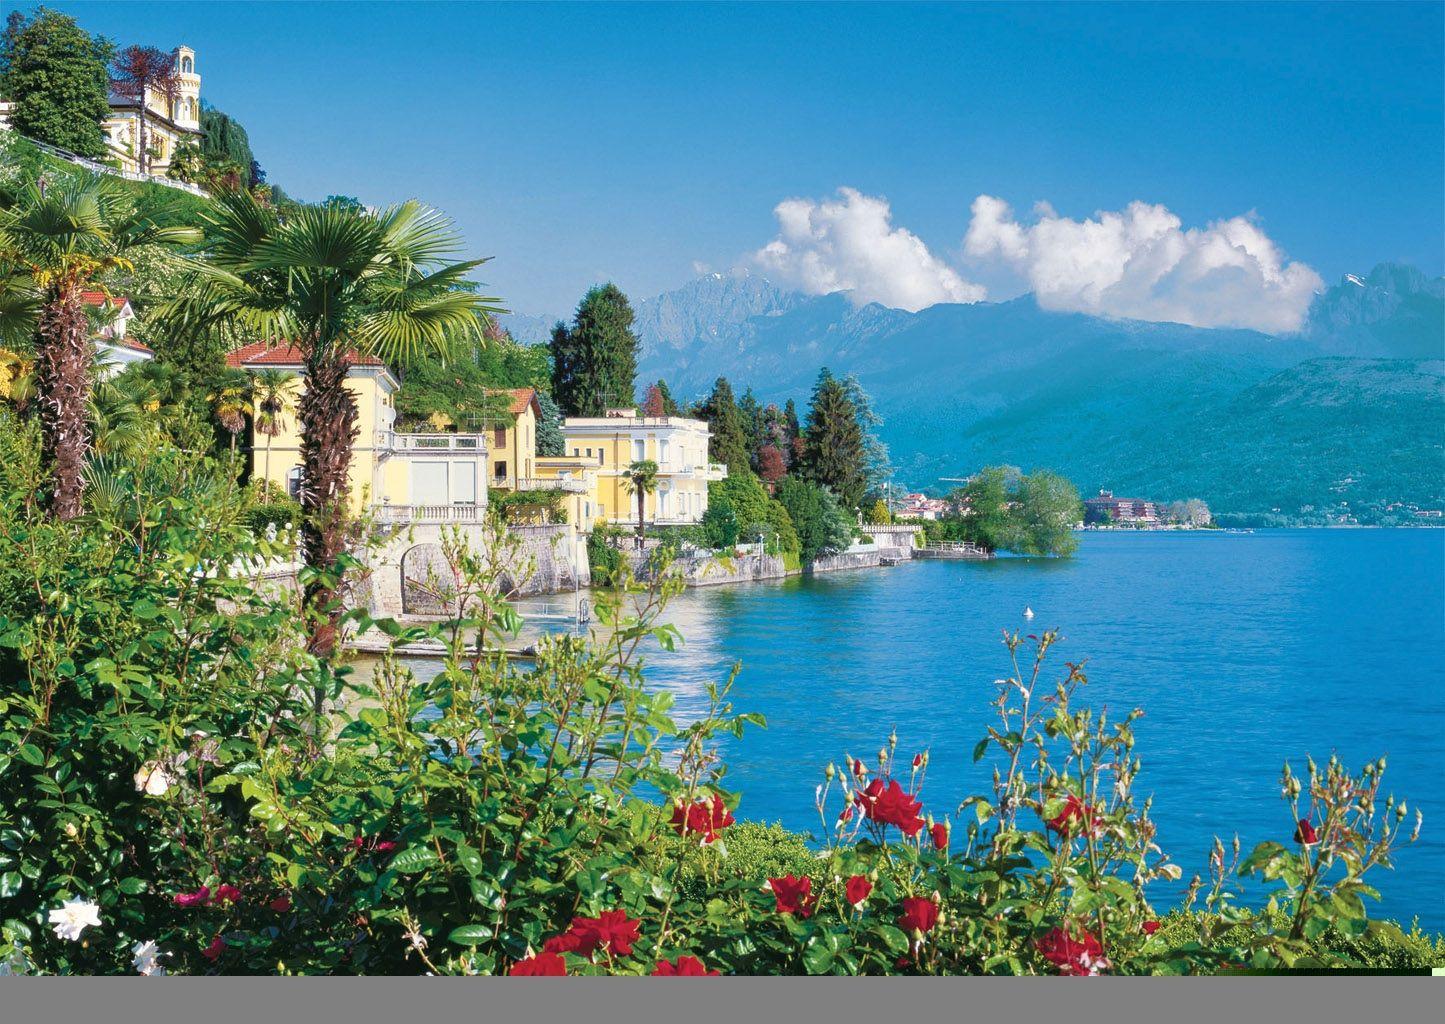 Lago Maggiore, Italy | Lake Como & Lakes Region of Italy ...